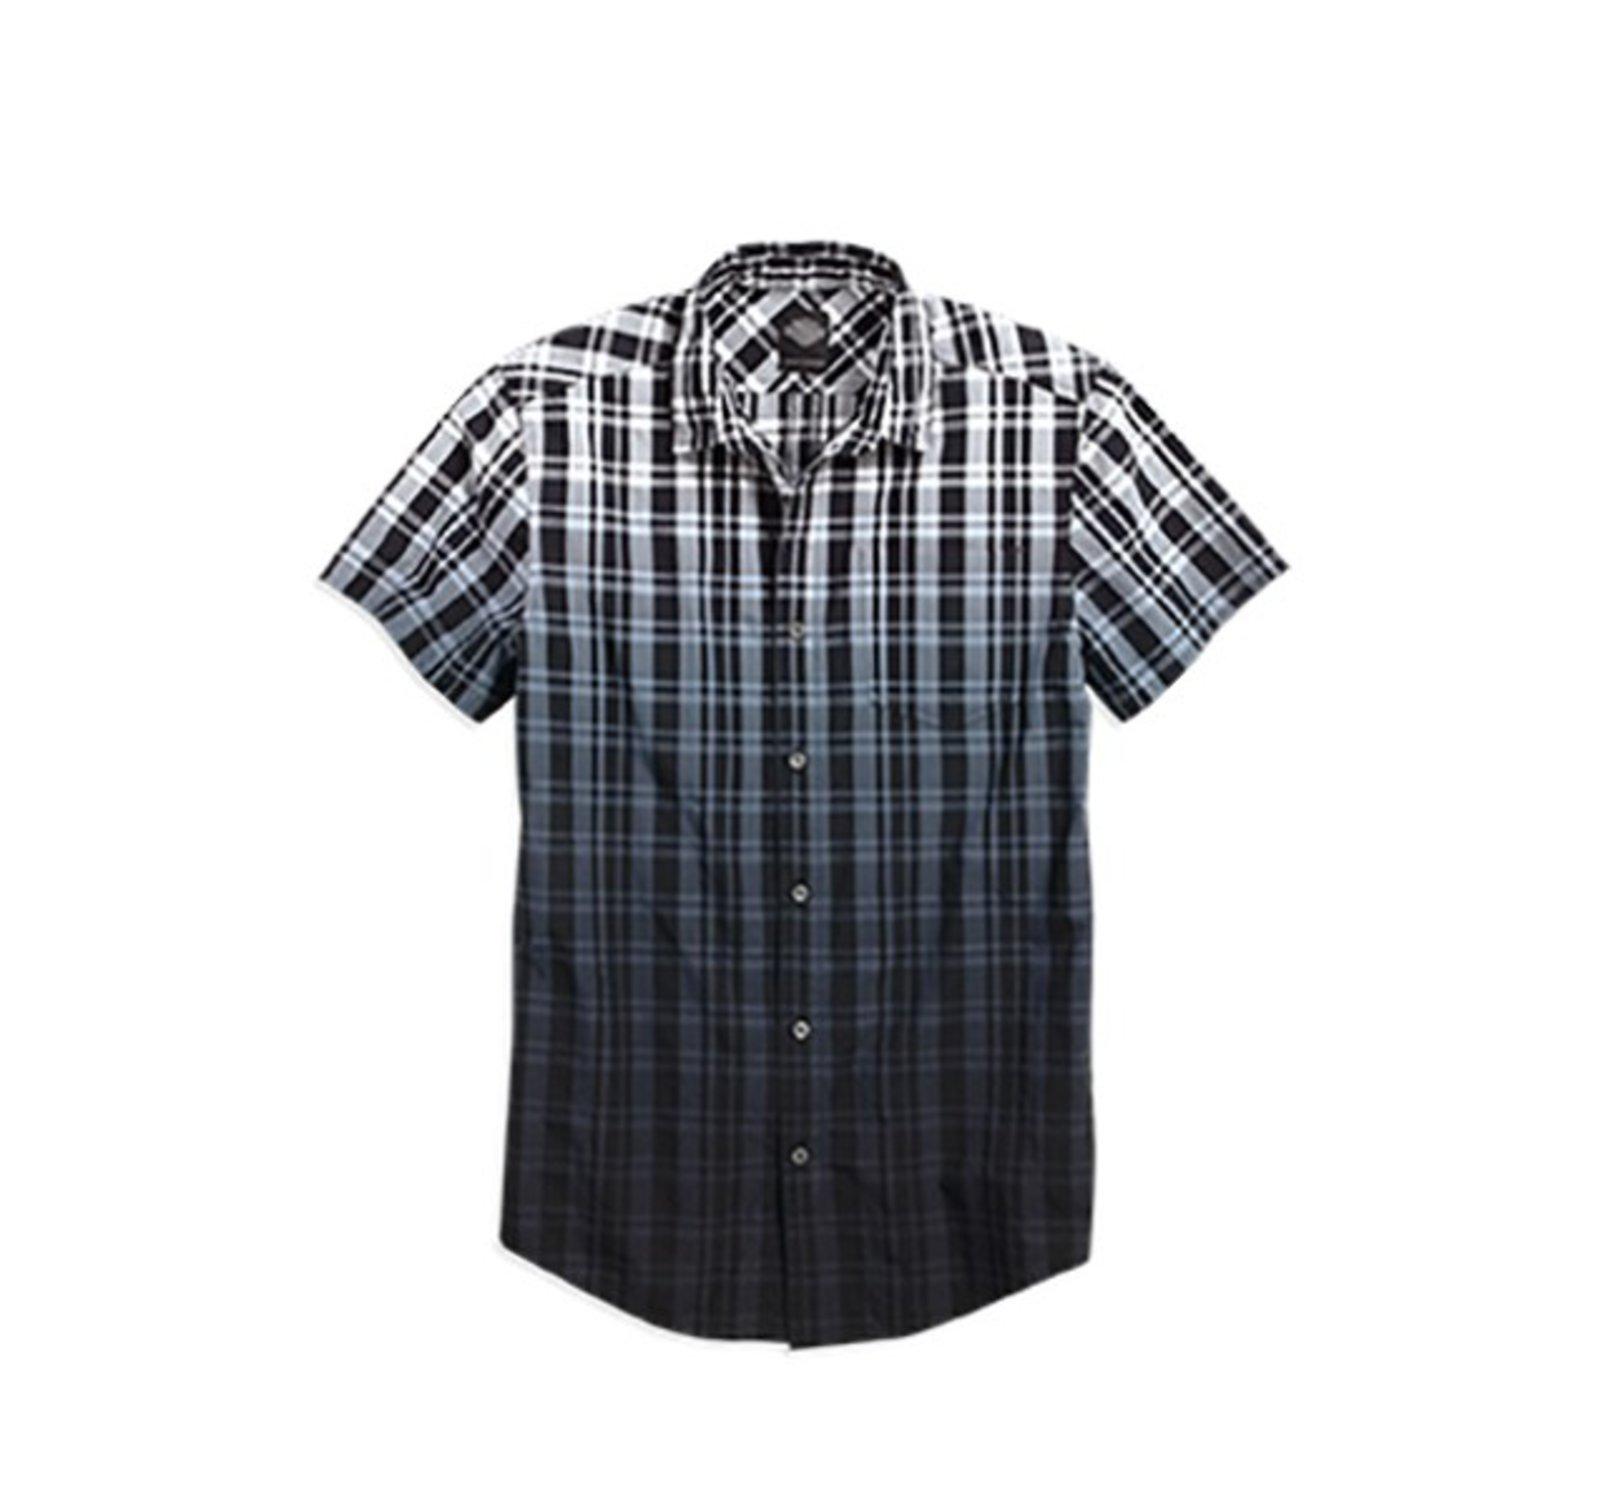 f2a698ca525 Pánská košile SHIRT-DIP DYE